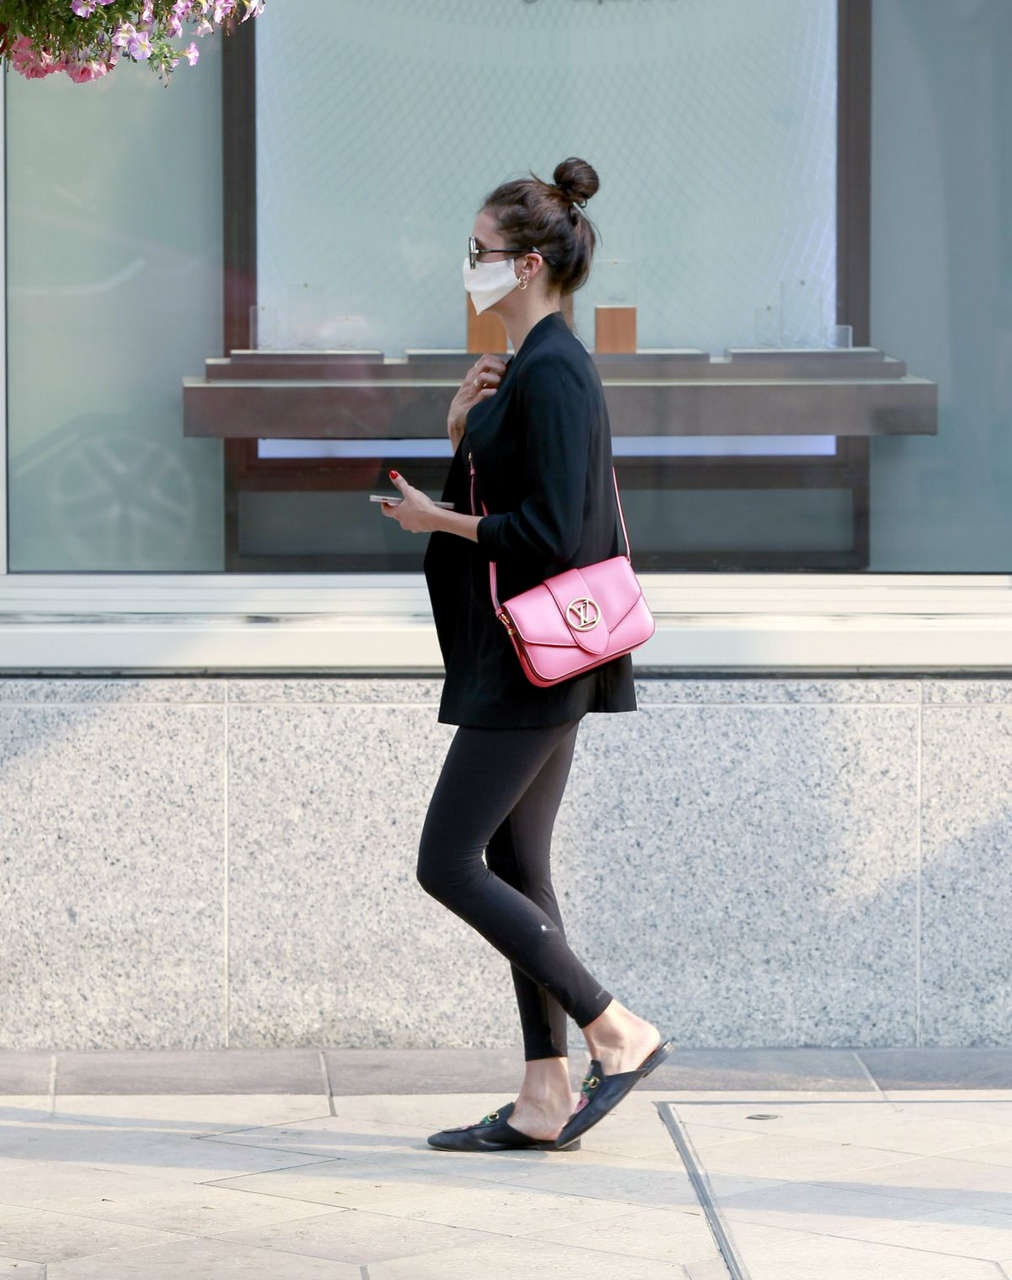 Nina Dobrev Louis Vuitton Store Beverly Hills